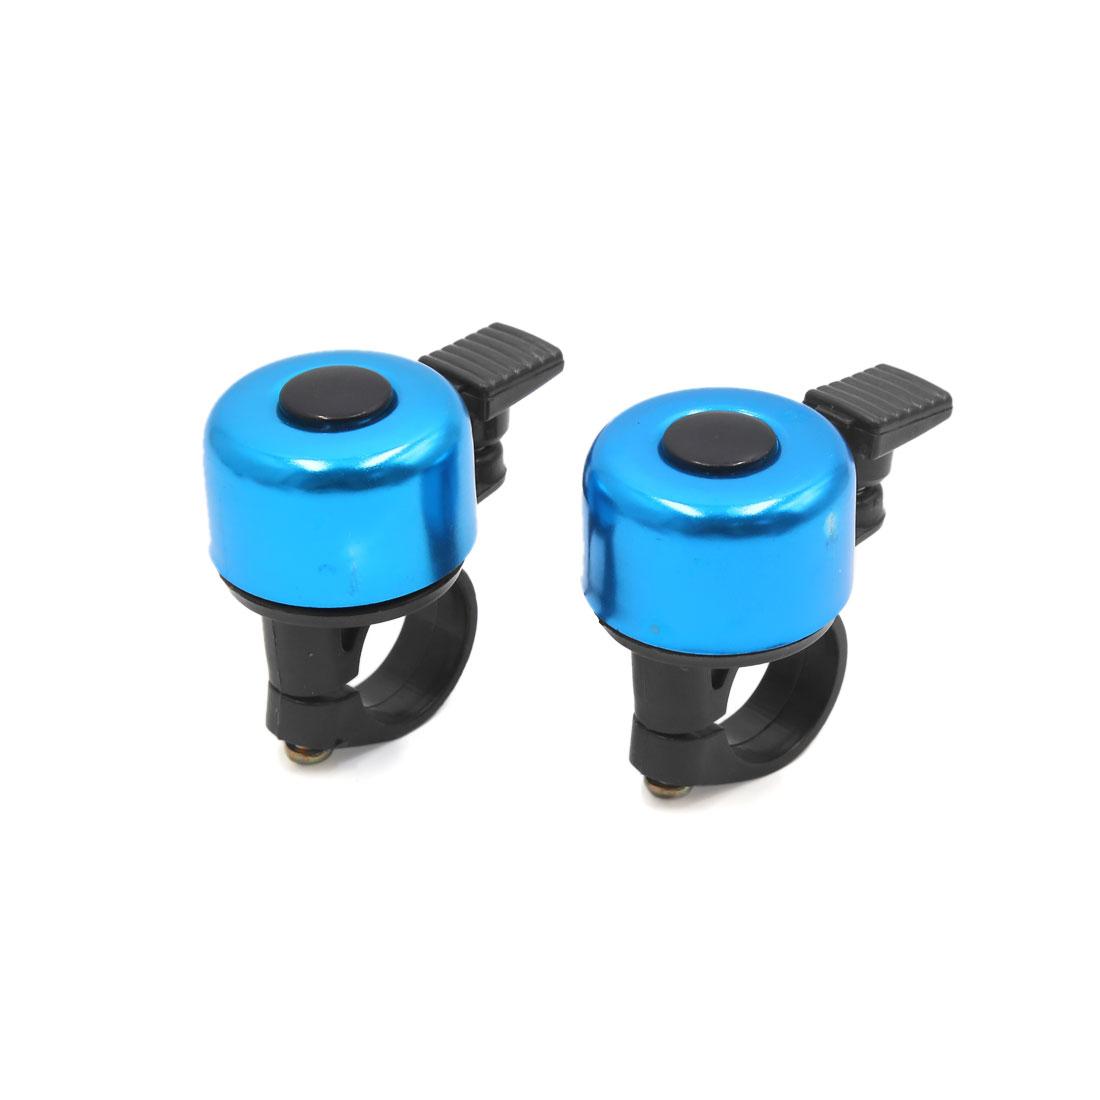 2 Pcs Blue Aluminum Alloy Bicycle Bike Cycling Handlebar Bell Ring Loud Horn